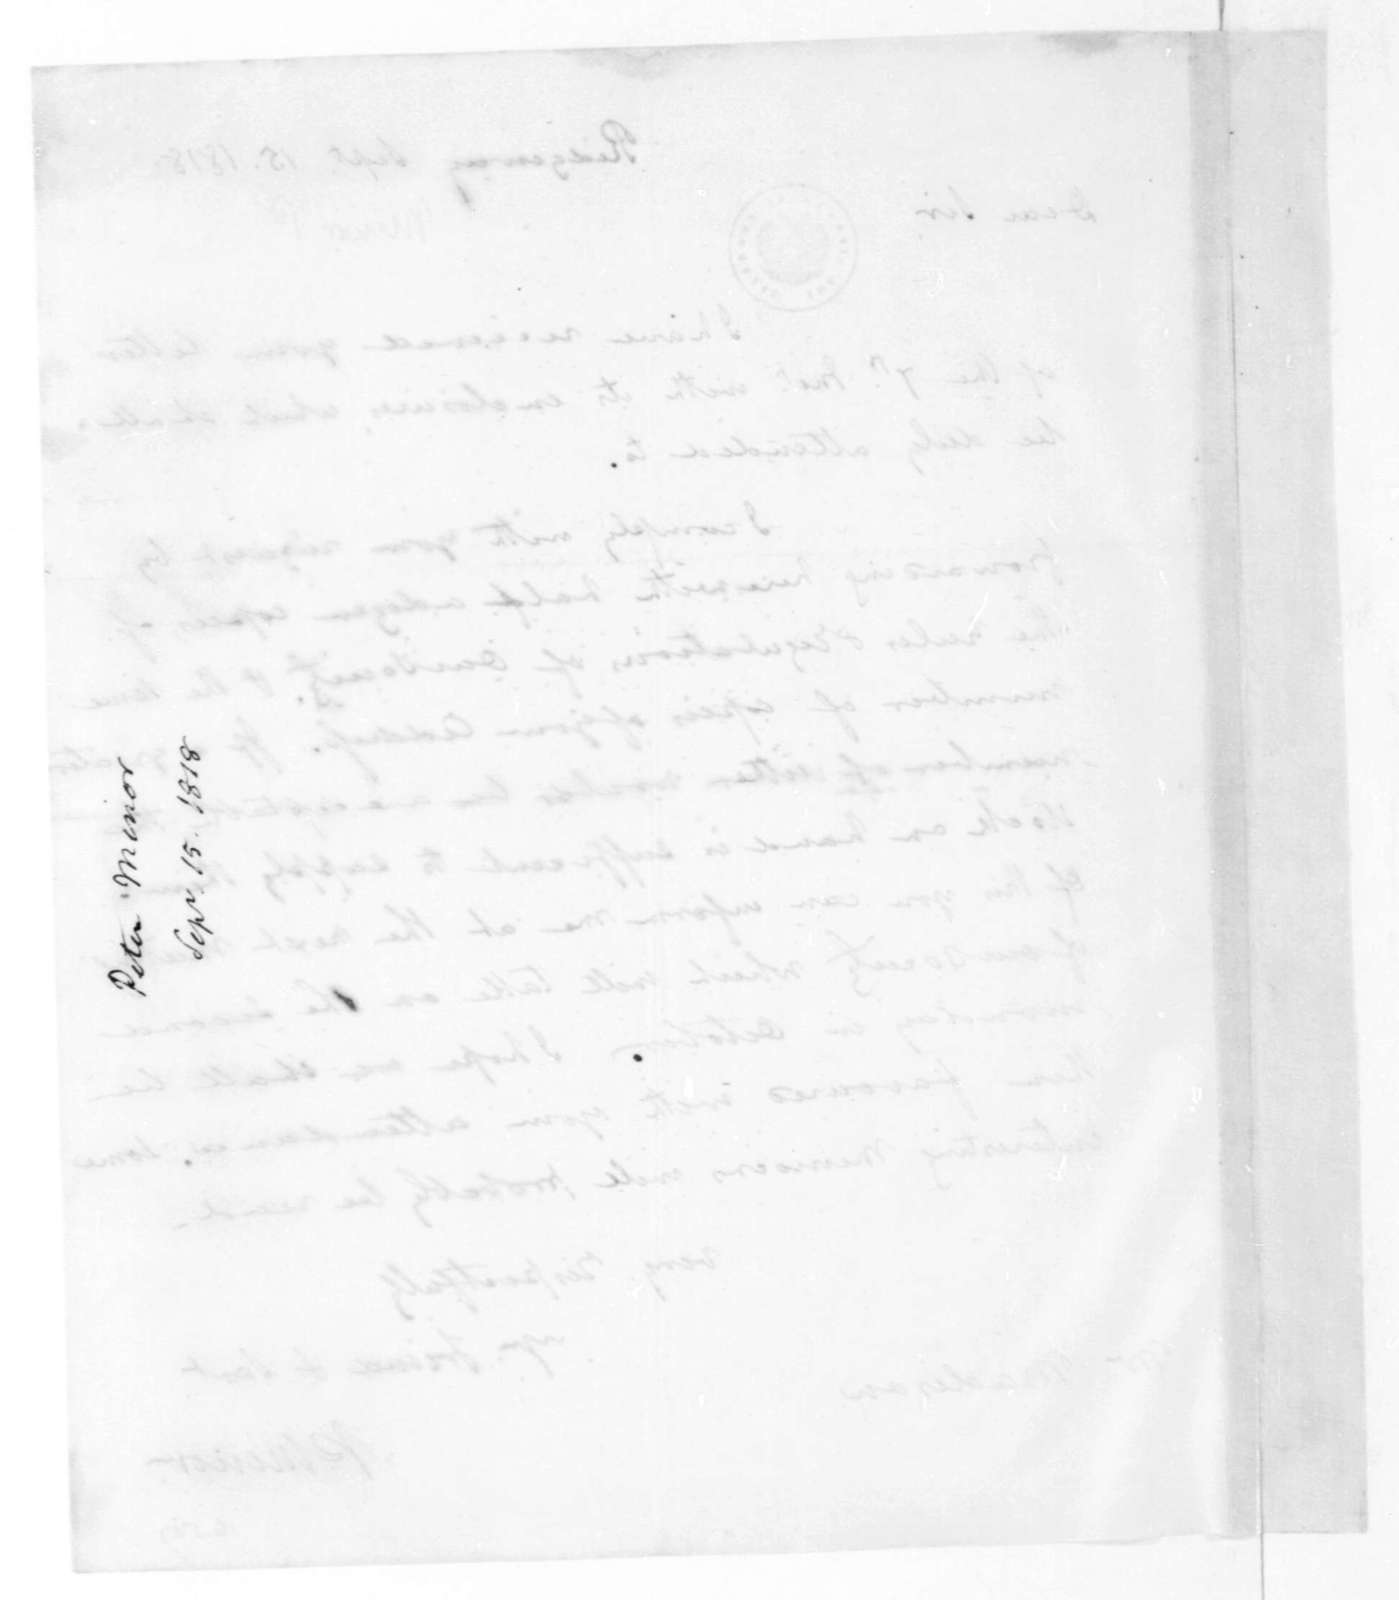 Peter Minor to James Madison, September 15, 1818.